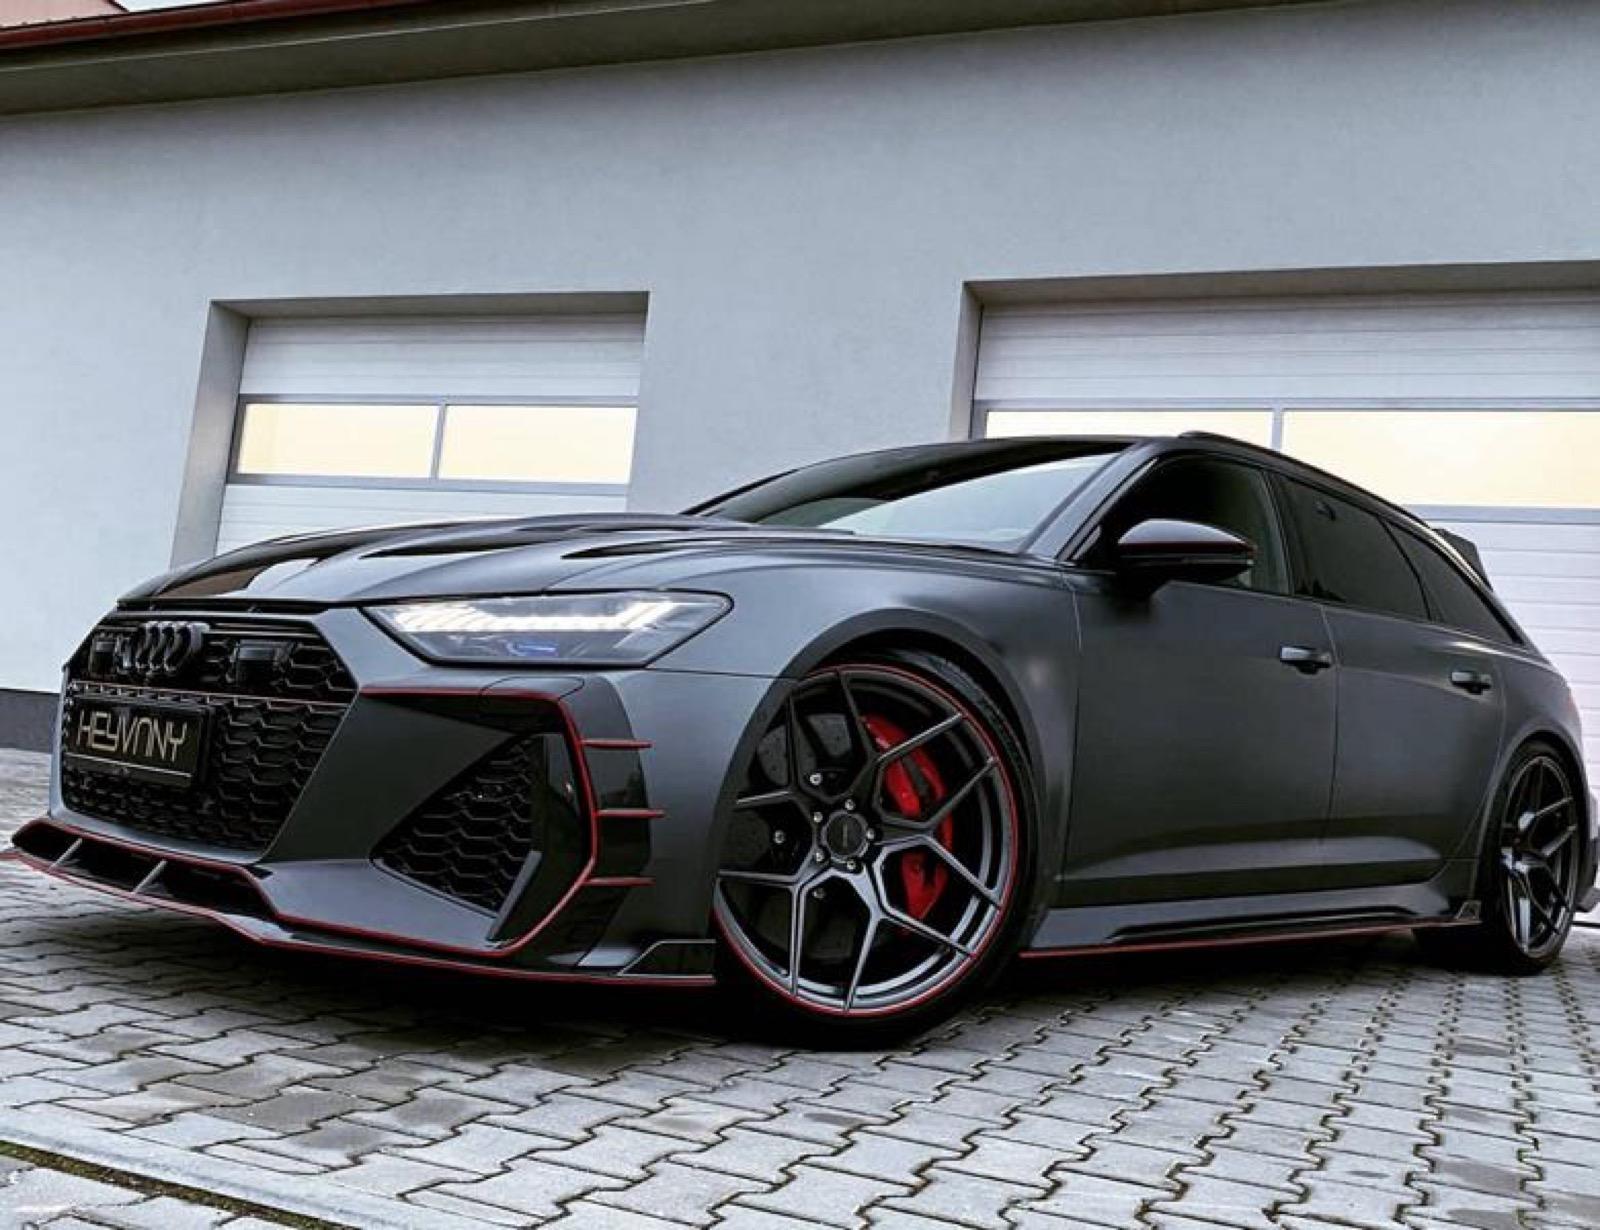 Audi-RS6-Avant-by-Keyvany-6